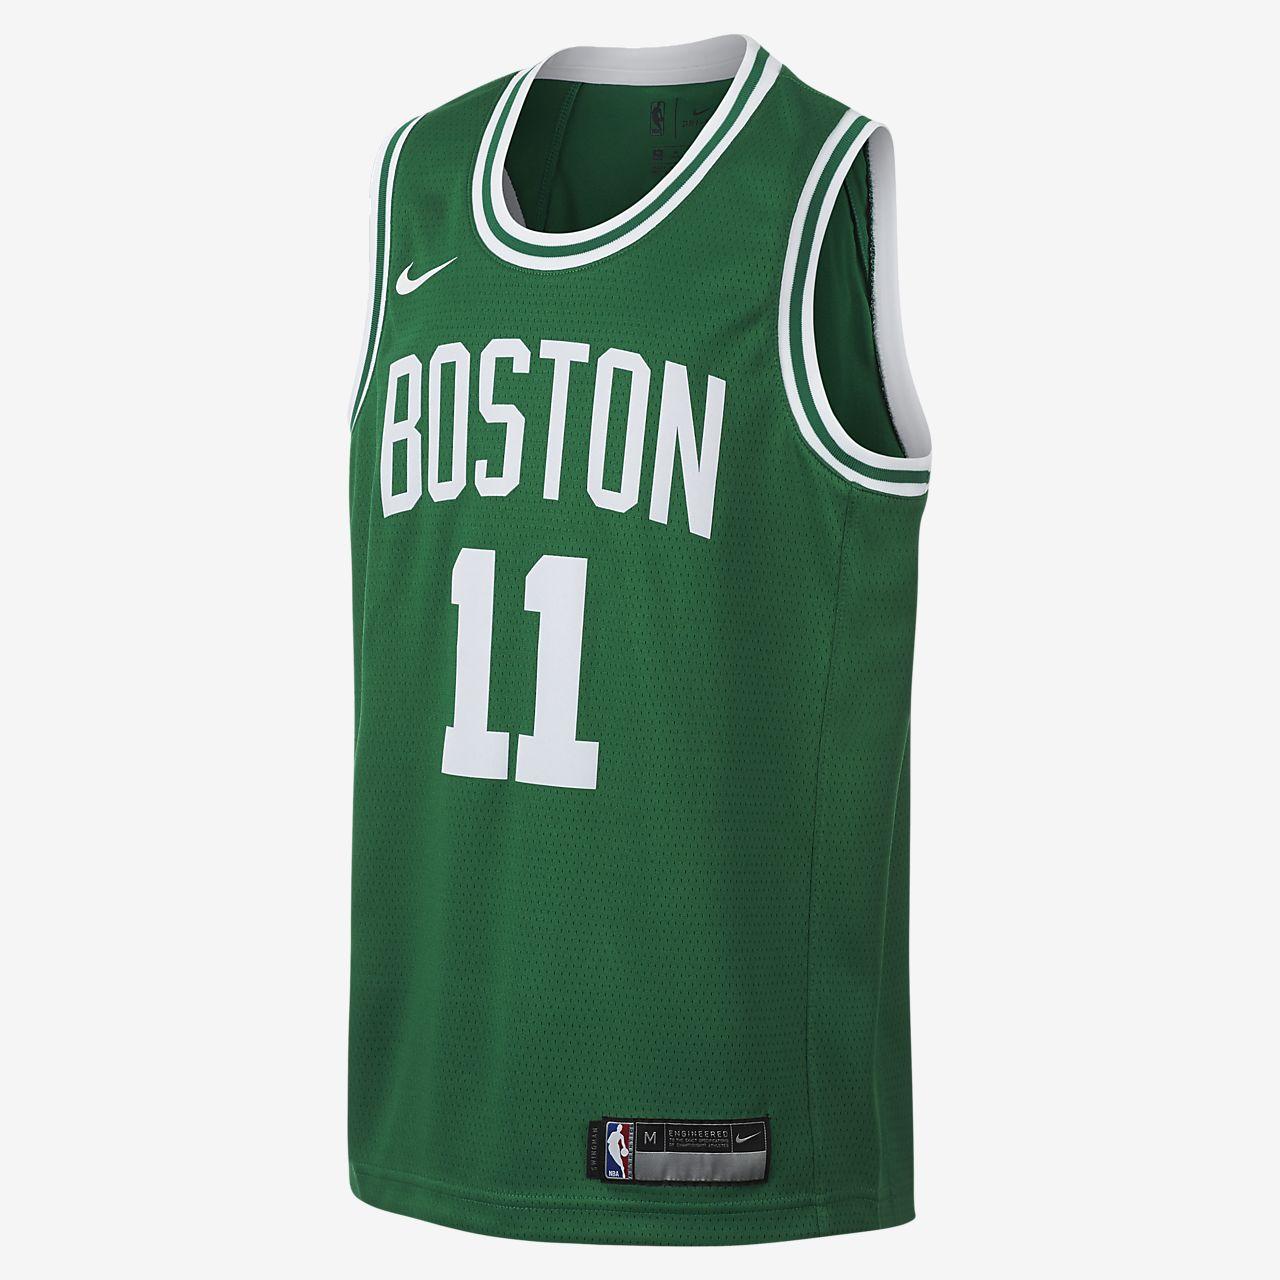 Camisola NBA Kyrie Irving Boston Celtics Nike Icon Edition Swingman Júnior